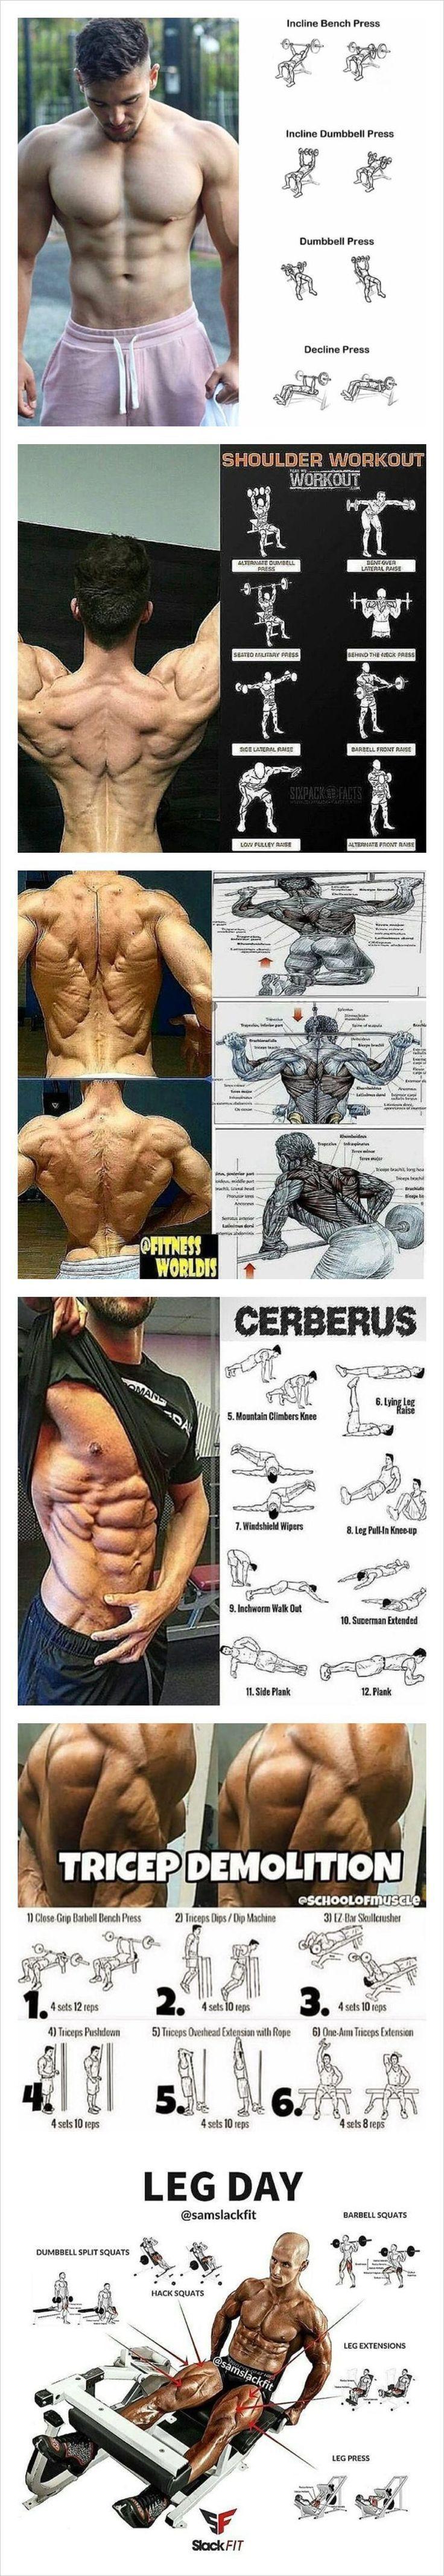 #Fitness #Training #Athlet #Diet #Übung #Zitat #Workout #BodyFat #Gym #Workout #athlet #bodyfat #fit...